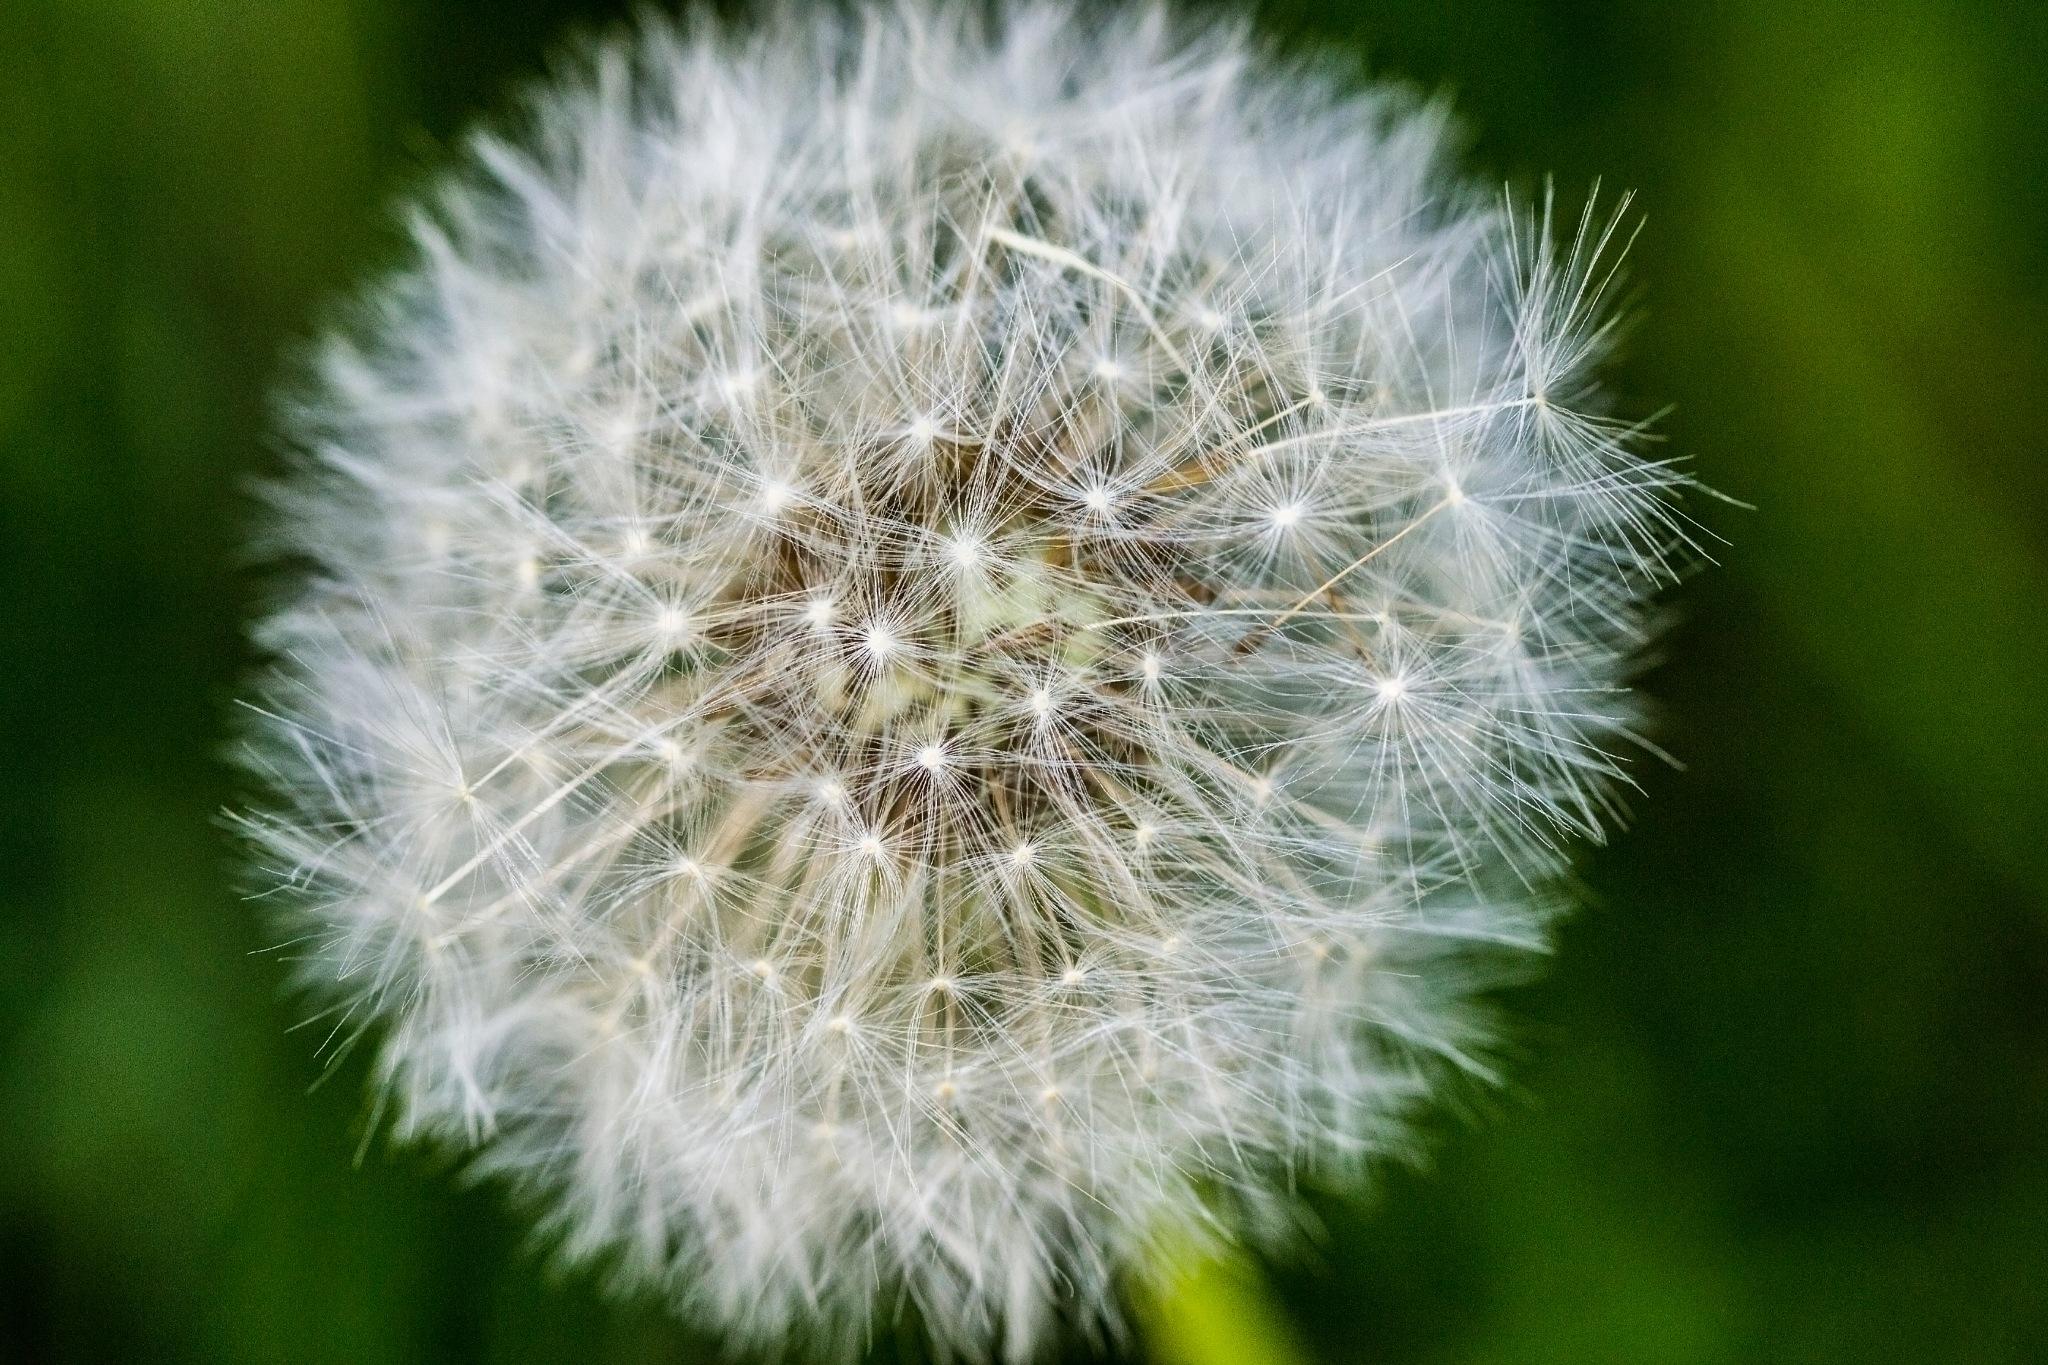 Dandelions by Patrick J. Whitfield